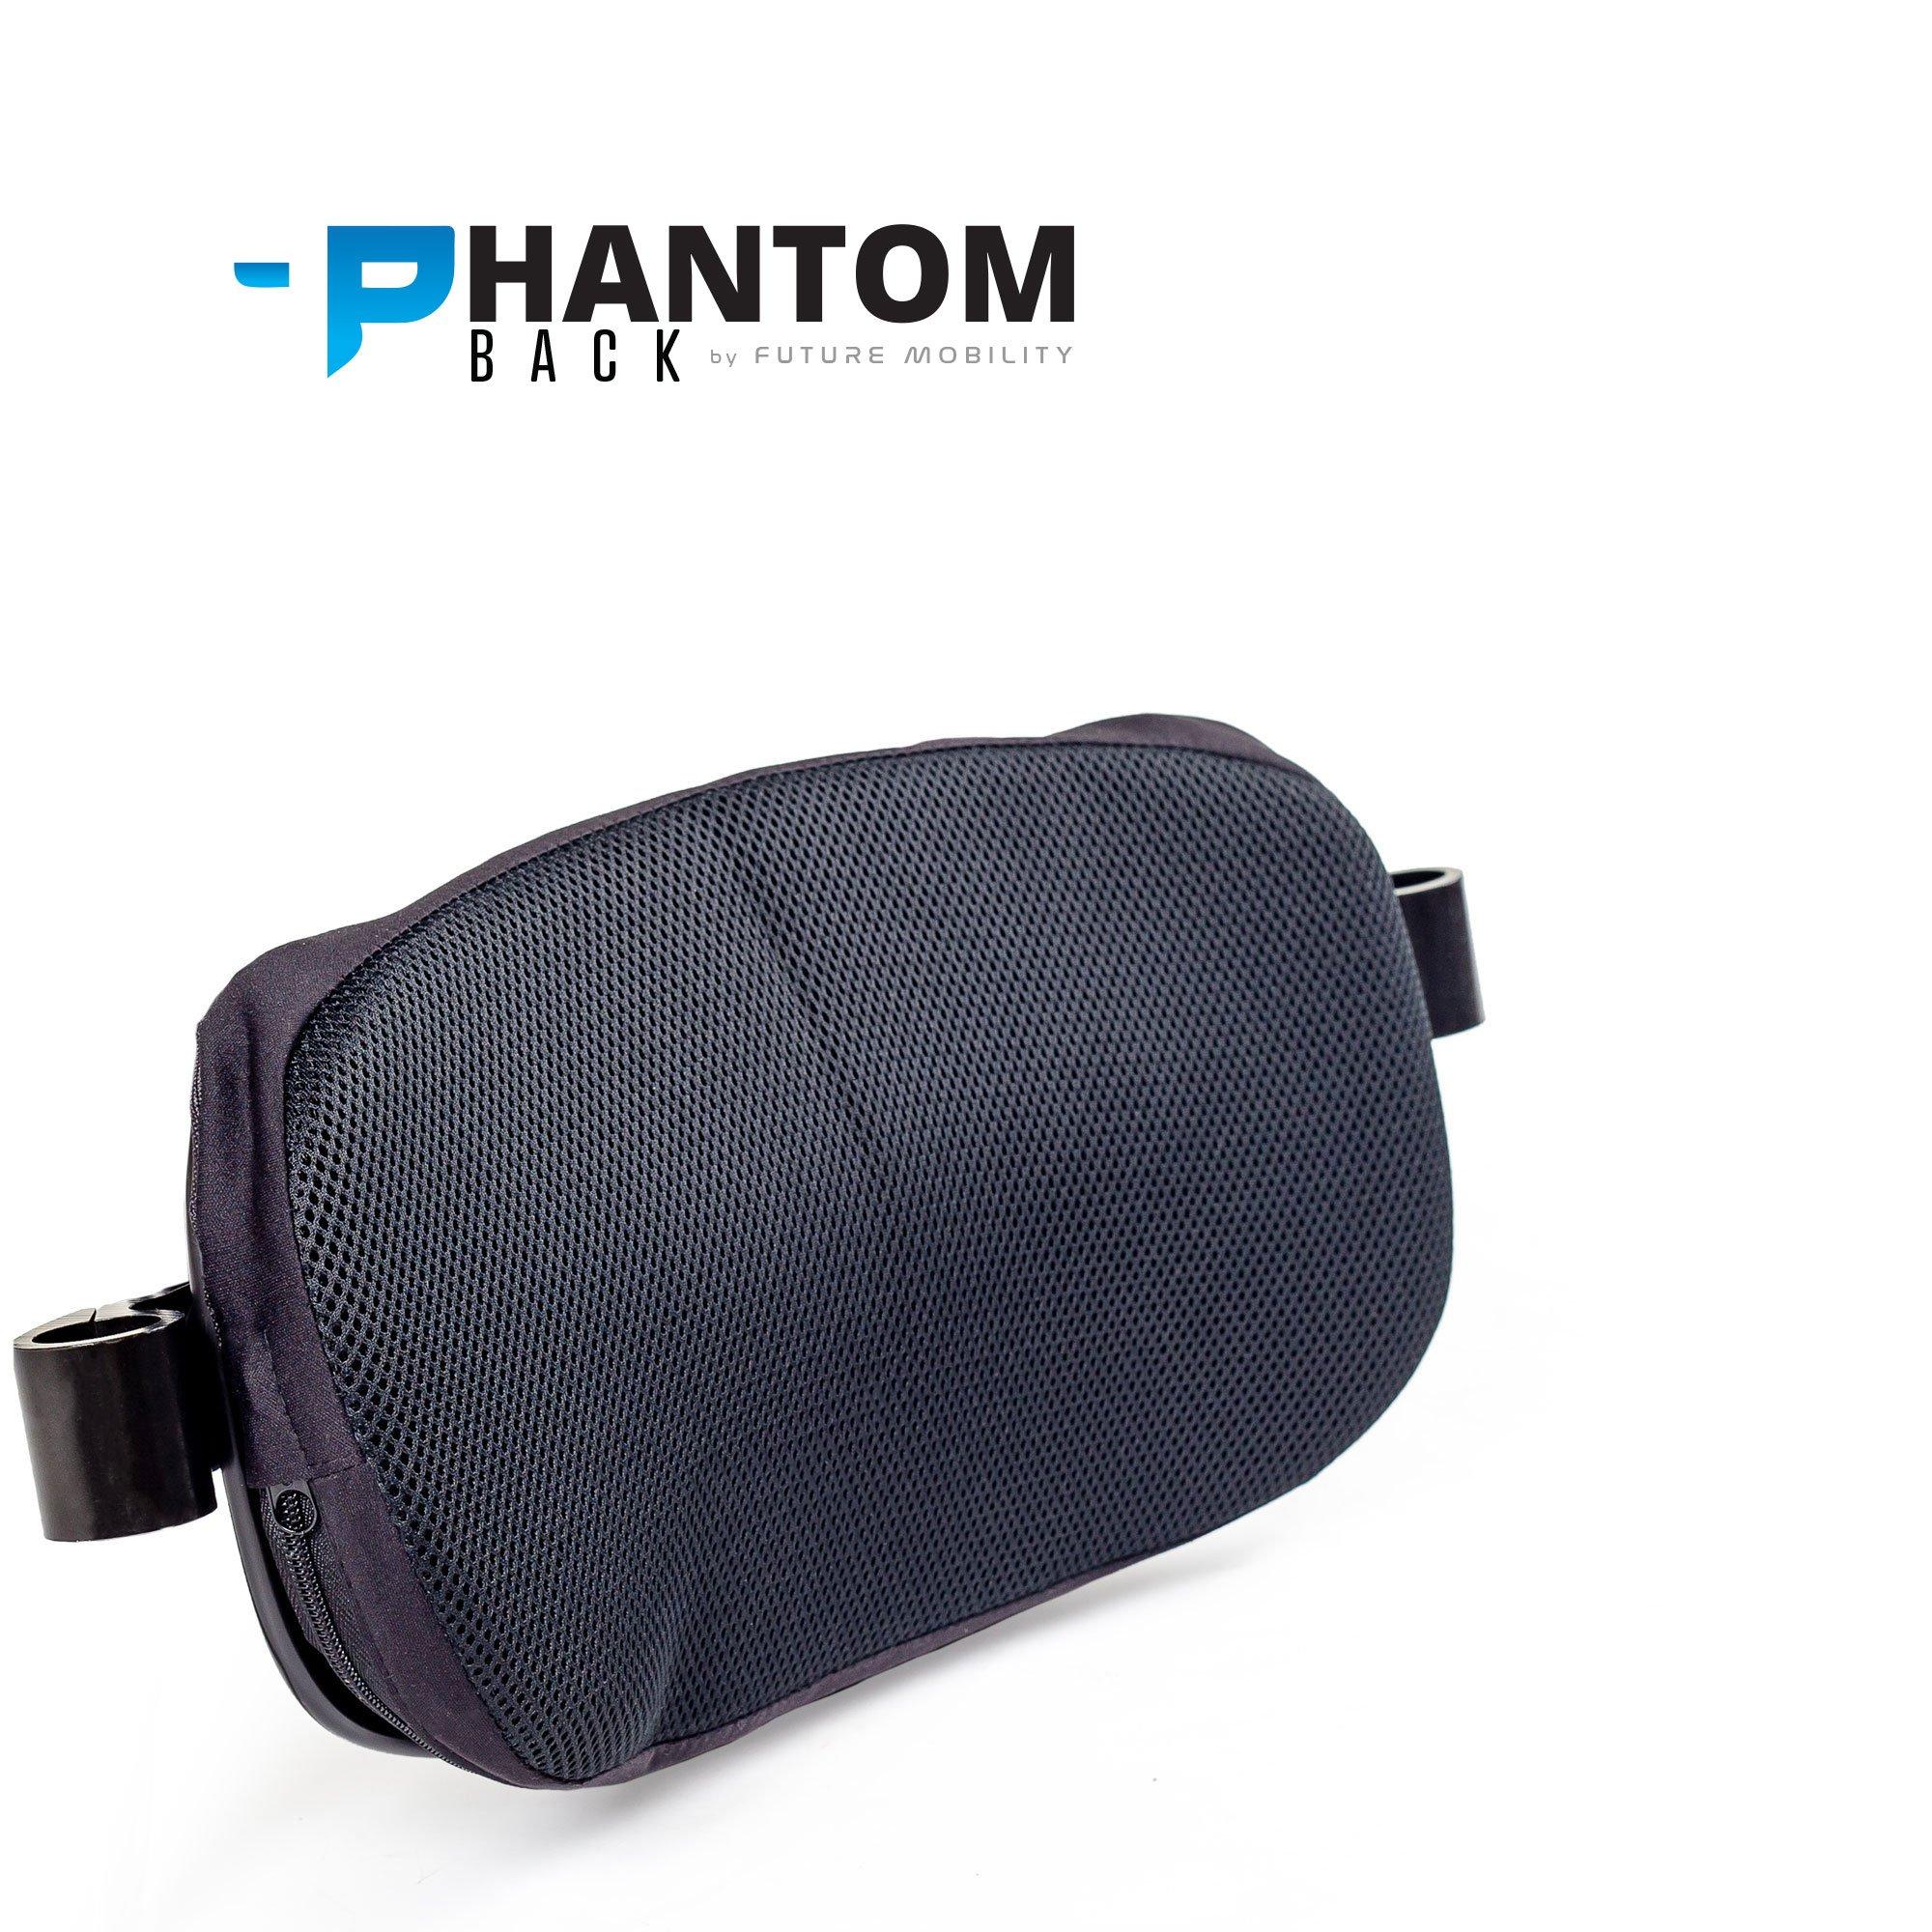 backrest wheelchair phantom